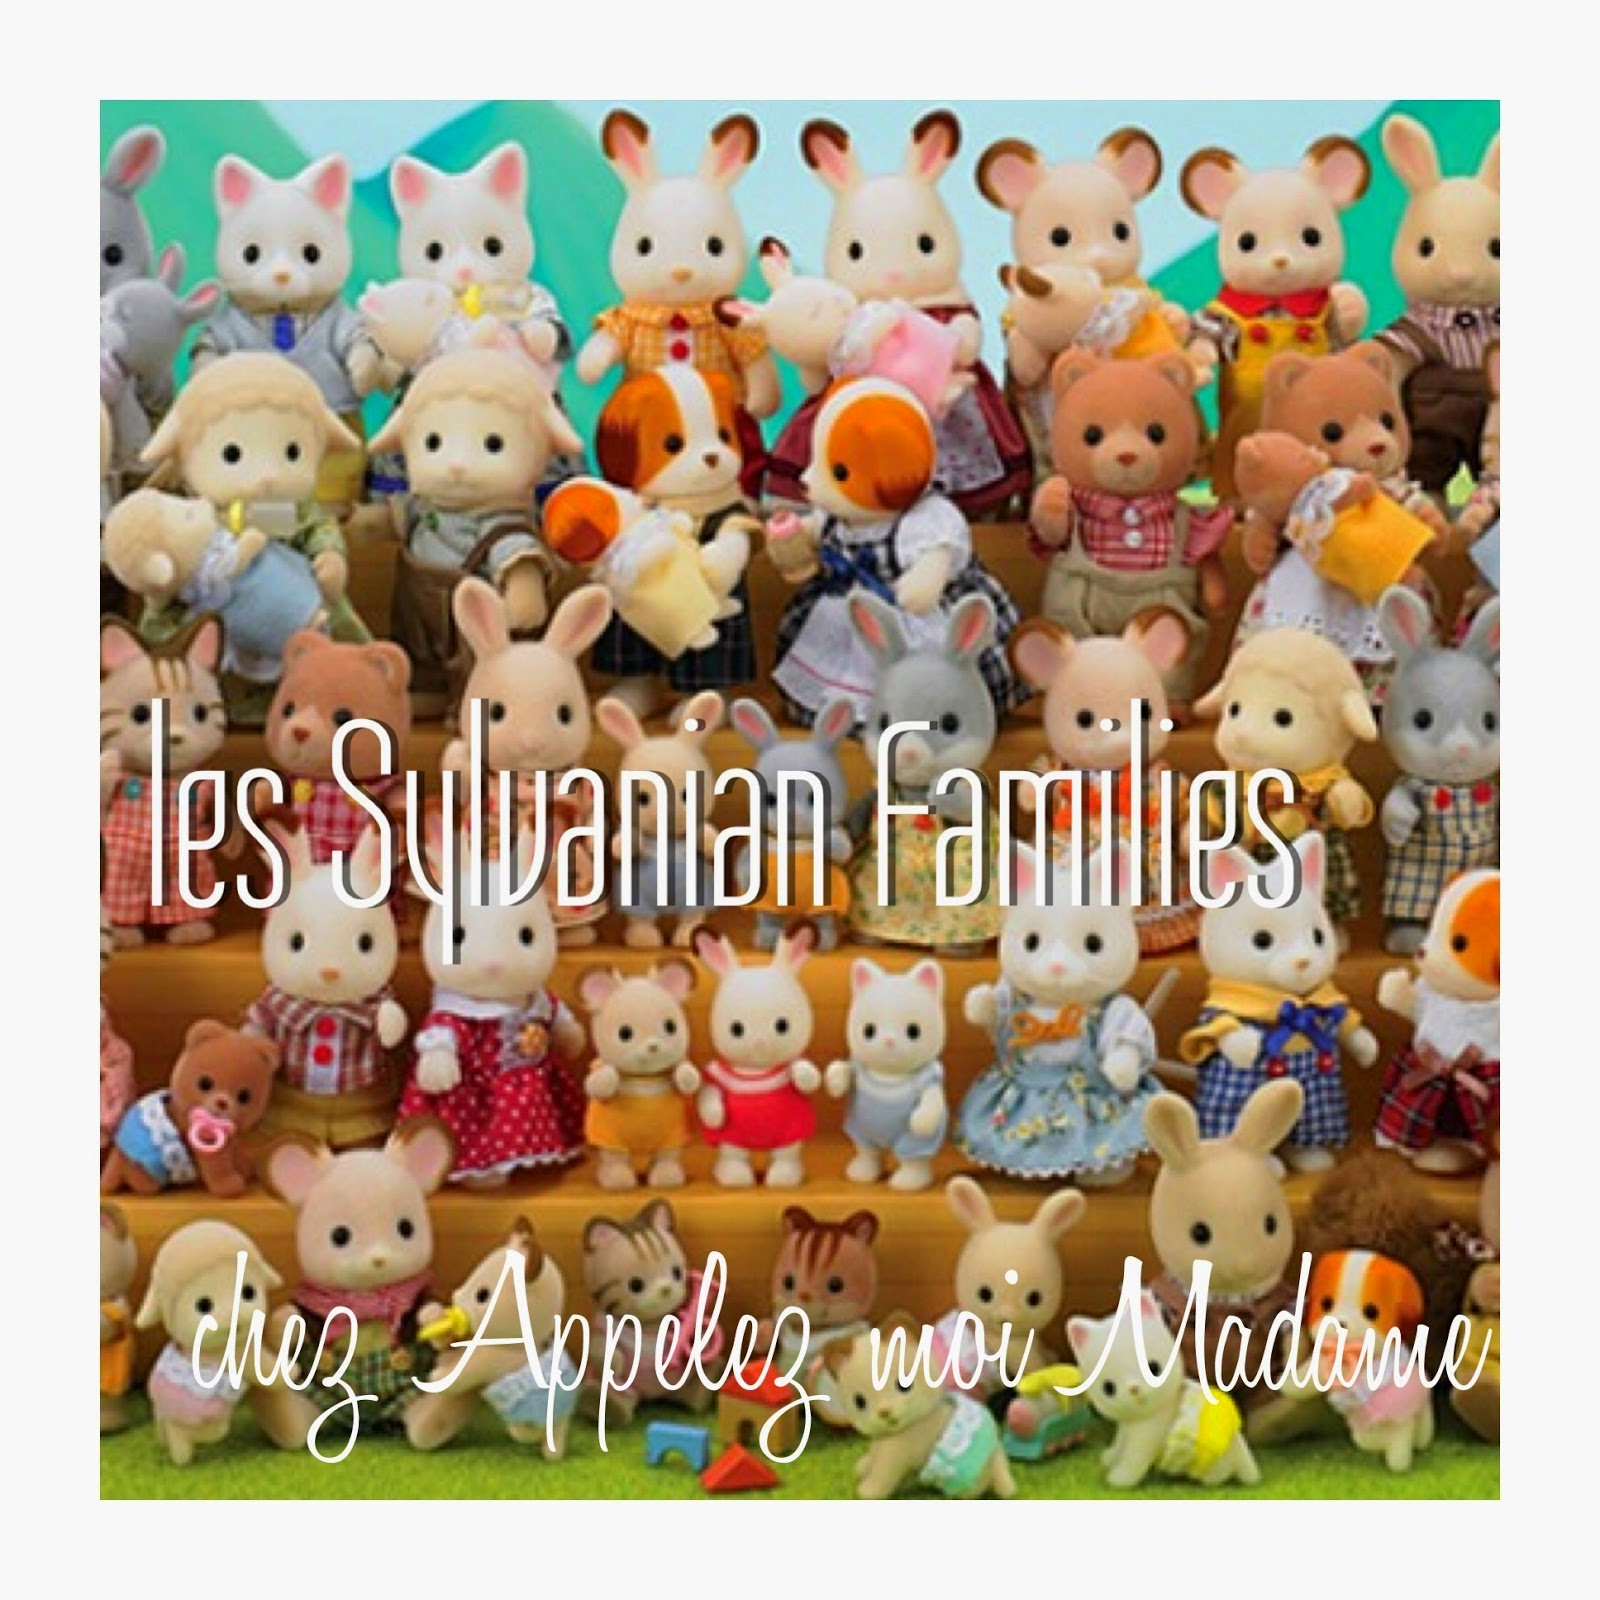 Rdv Sylvanian Families chez Appelez-moi Madame